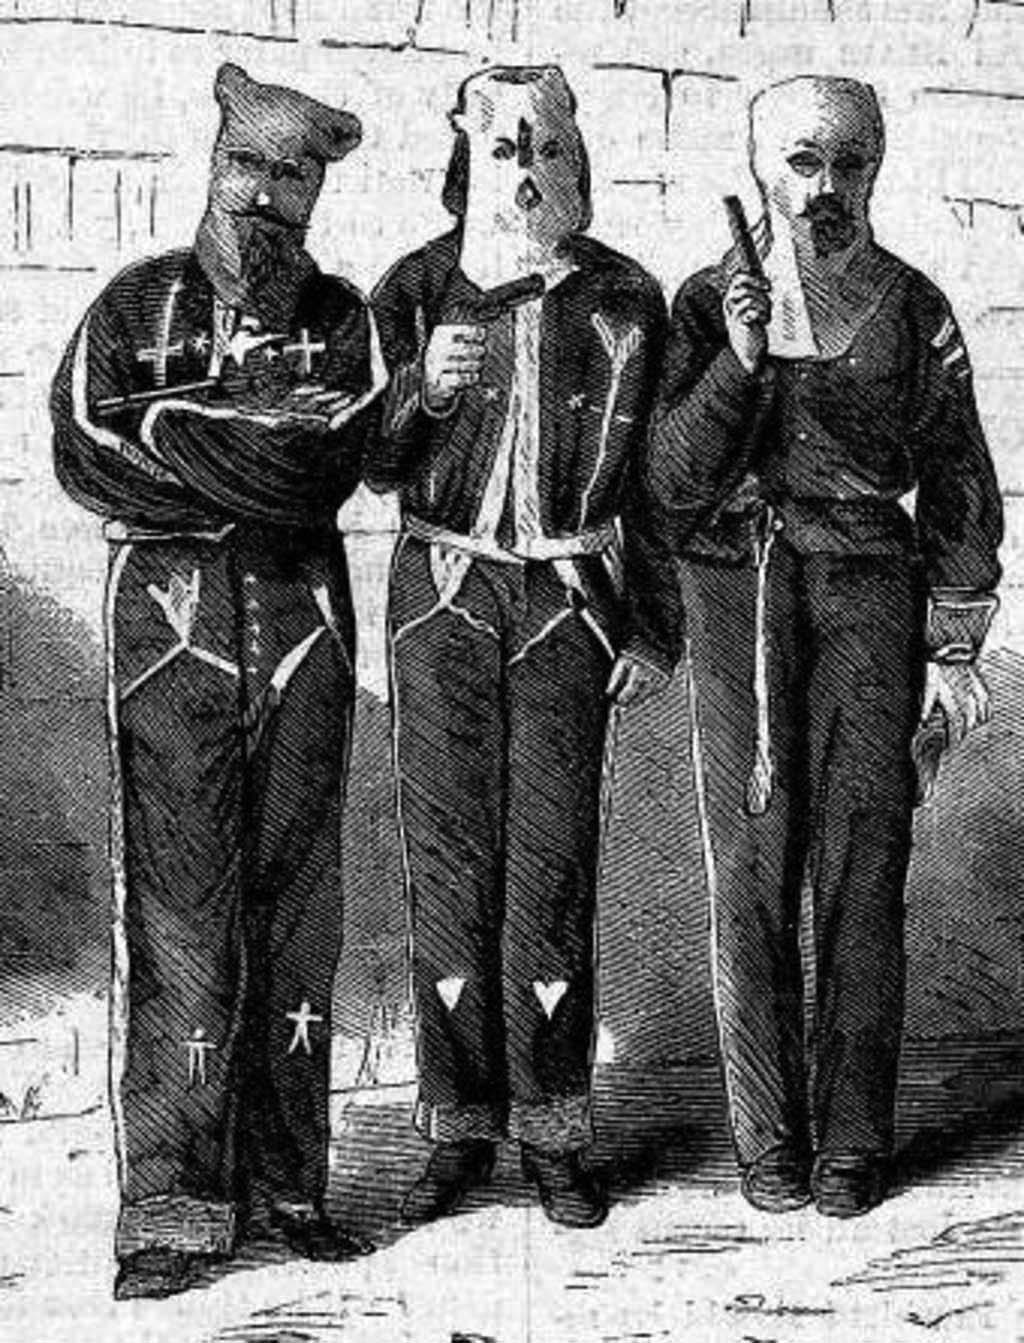 Three Tishomingo County, Mississippi Ku Klux Klan Members (Wikipedia)